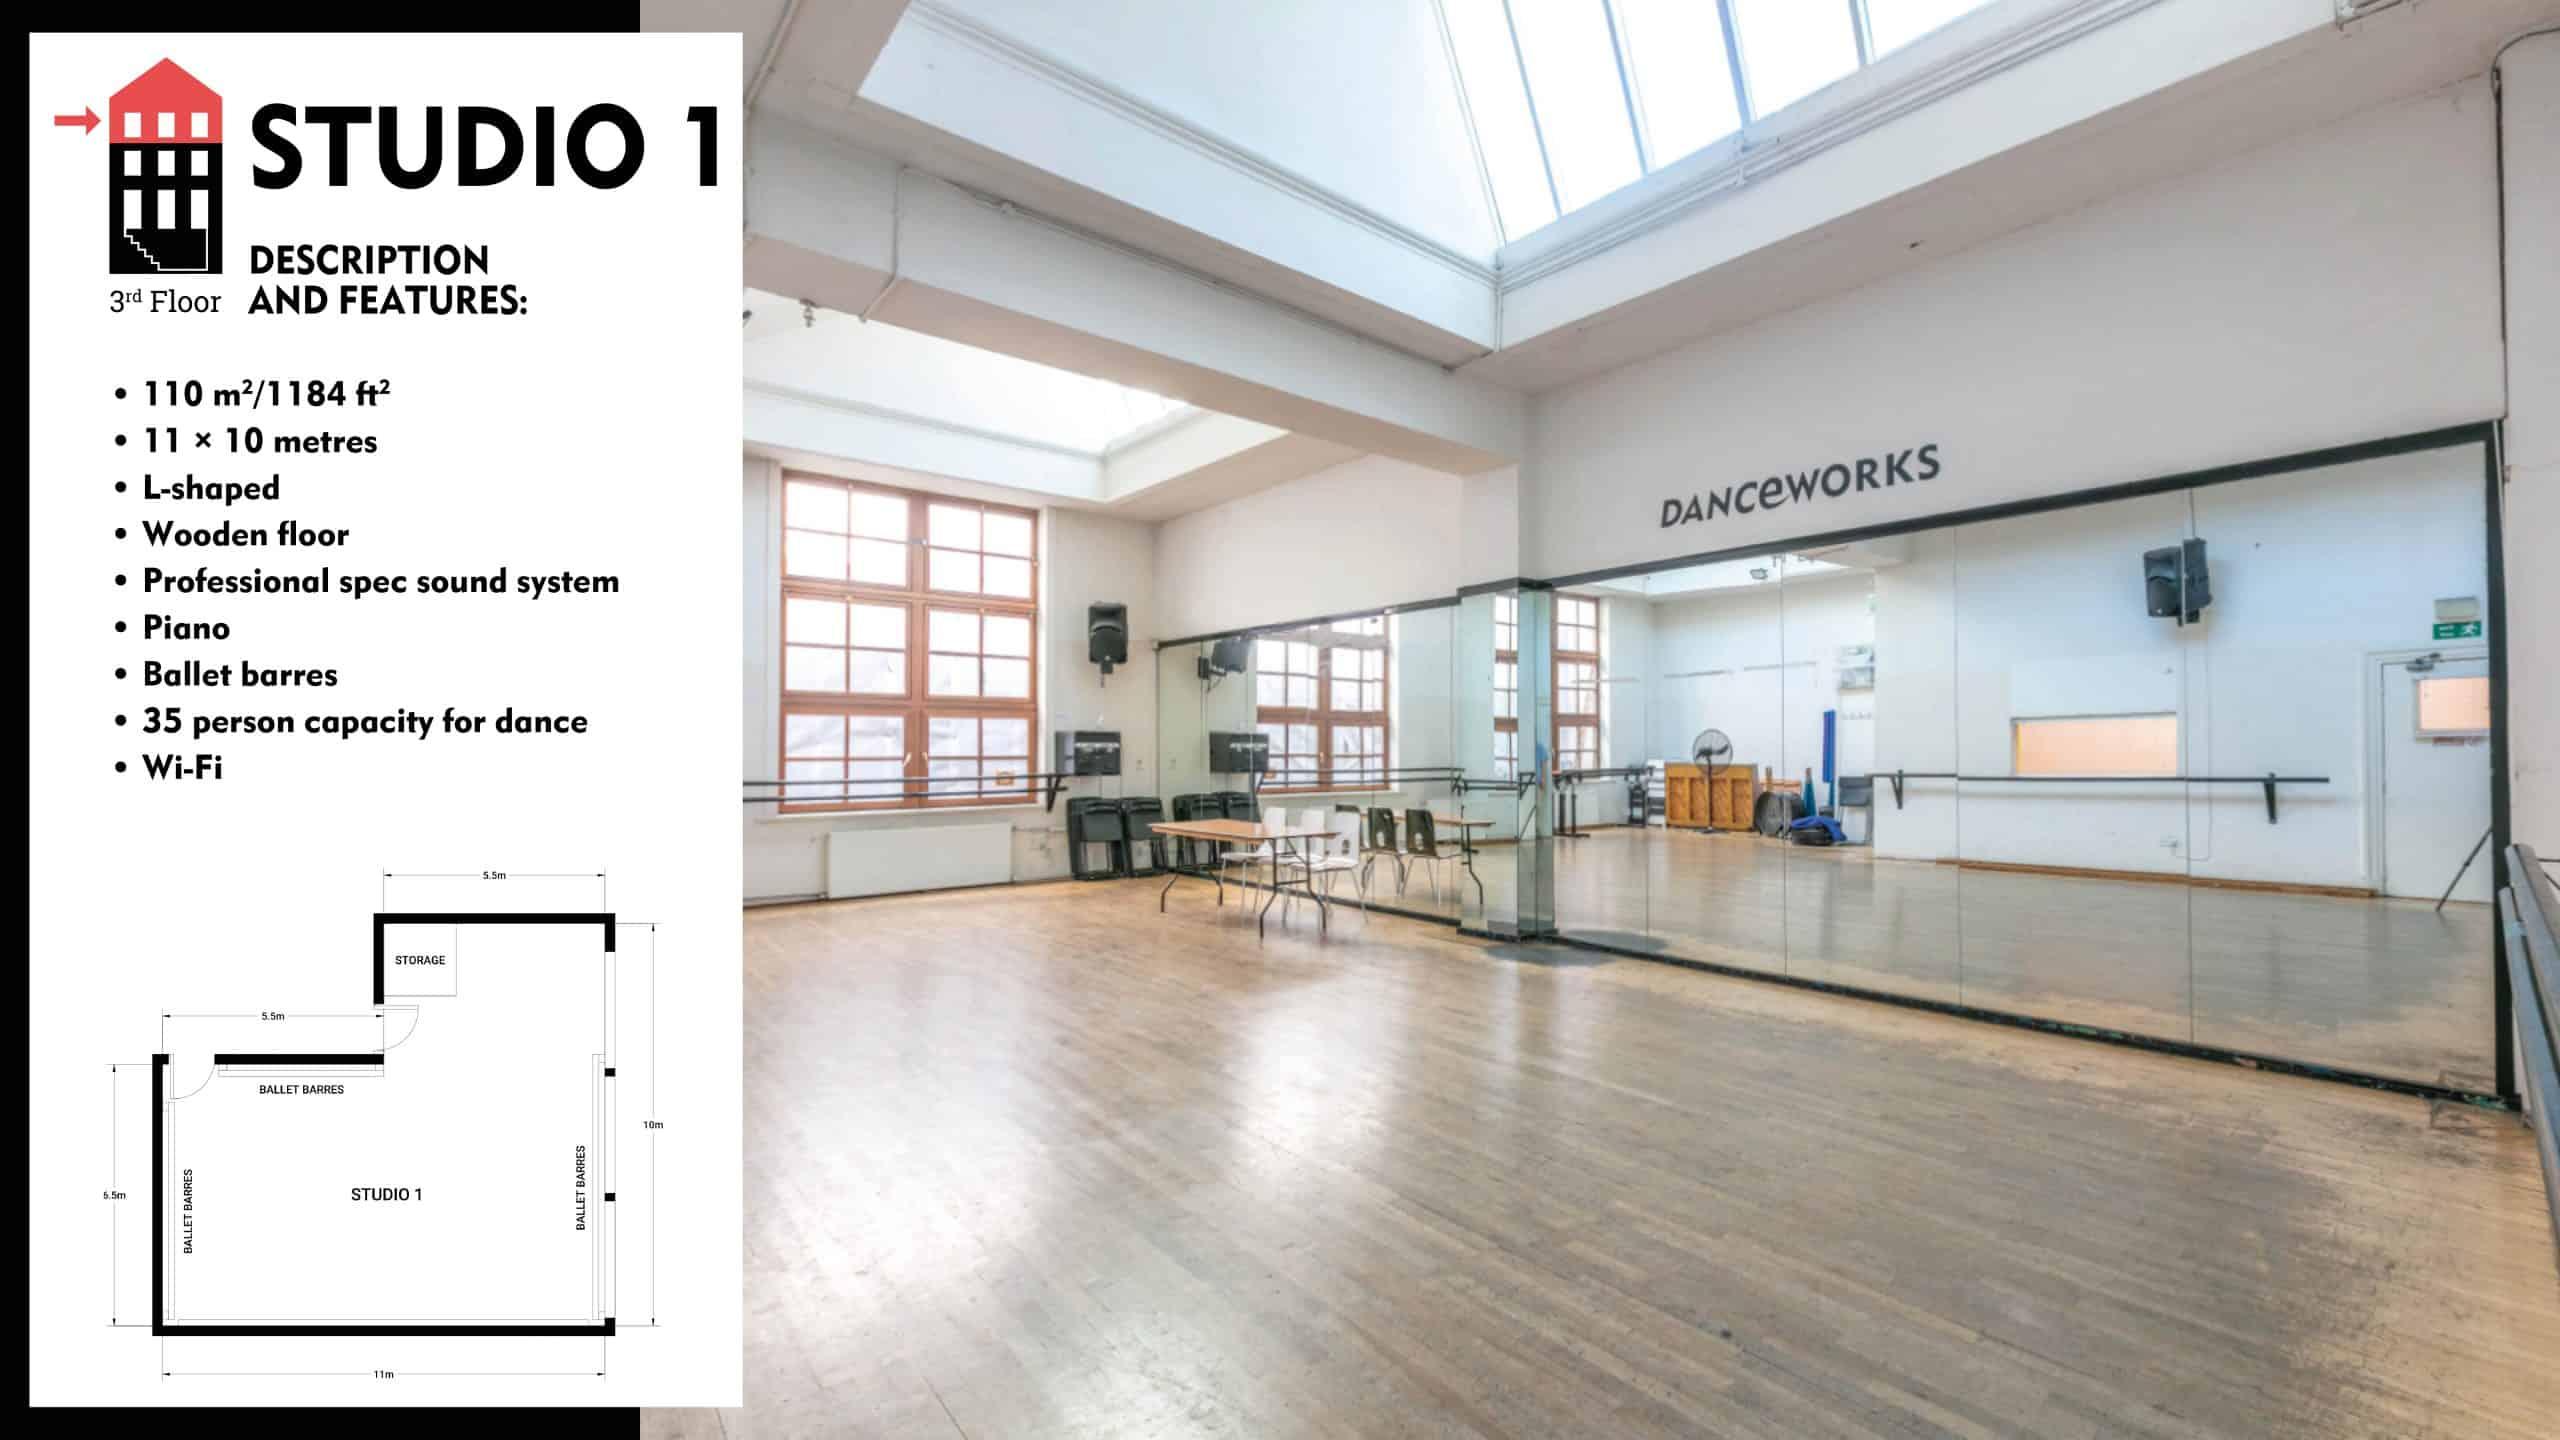 #Danceworks Studios 1 to Hire in London